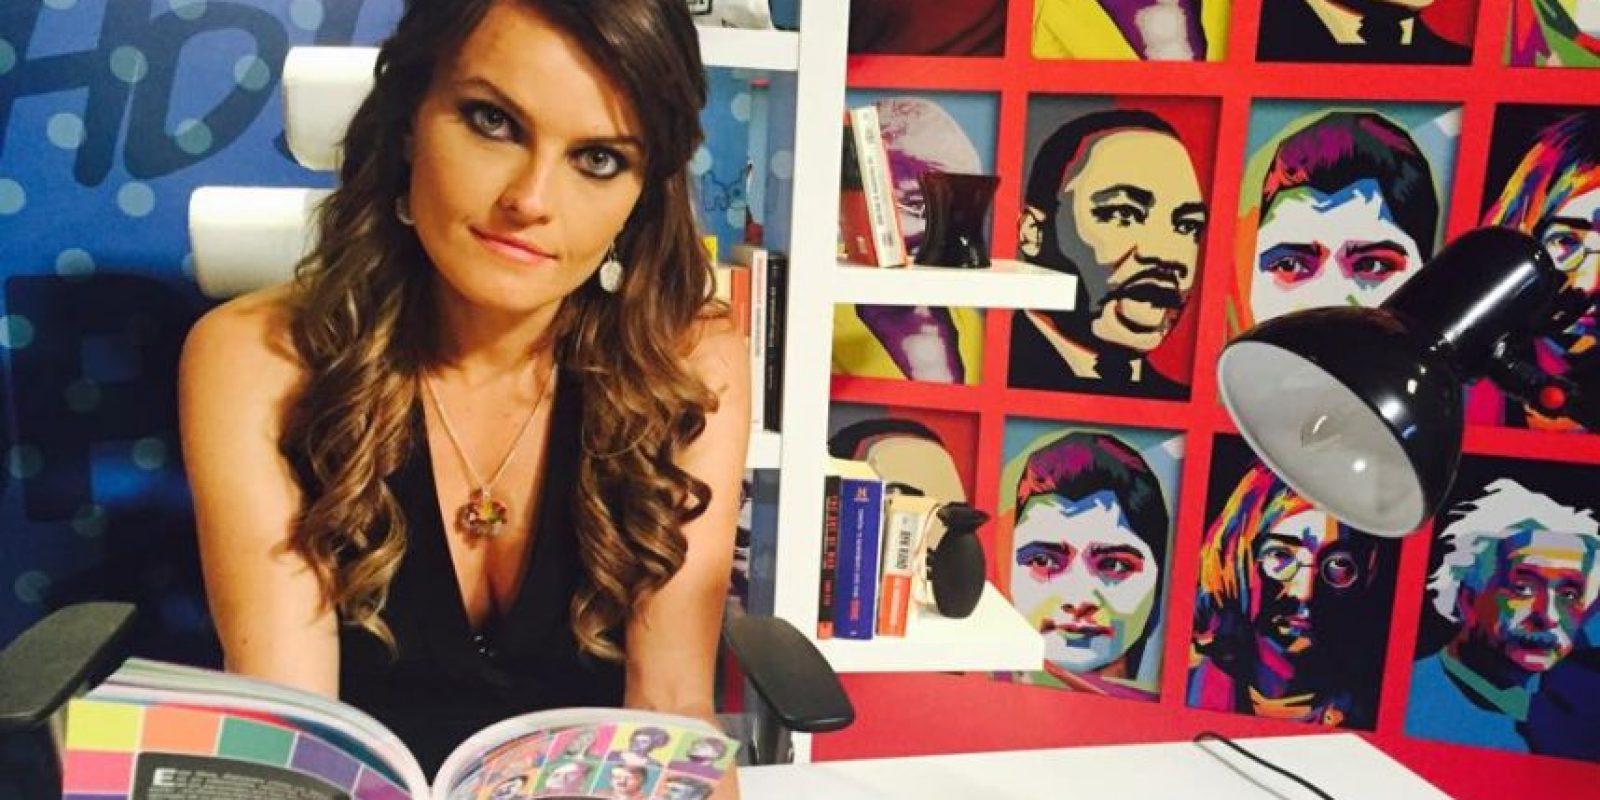 Es politóloga guatemalteca, de ascendencia cubana y húngara Foto:Facebook.com/GloriaAlvarez